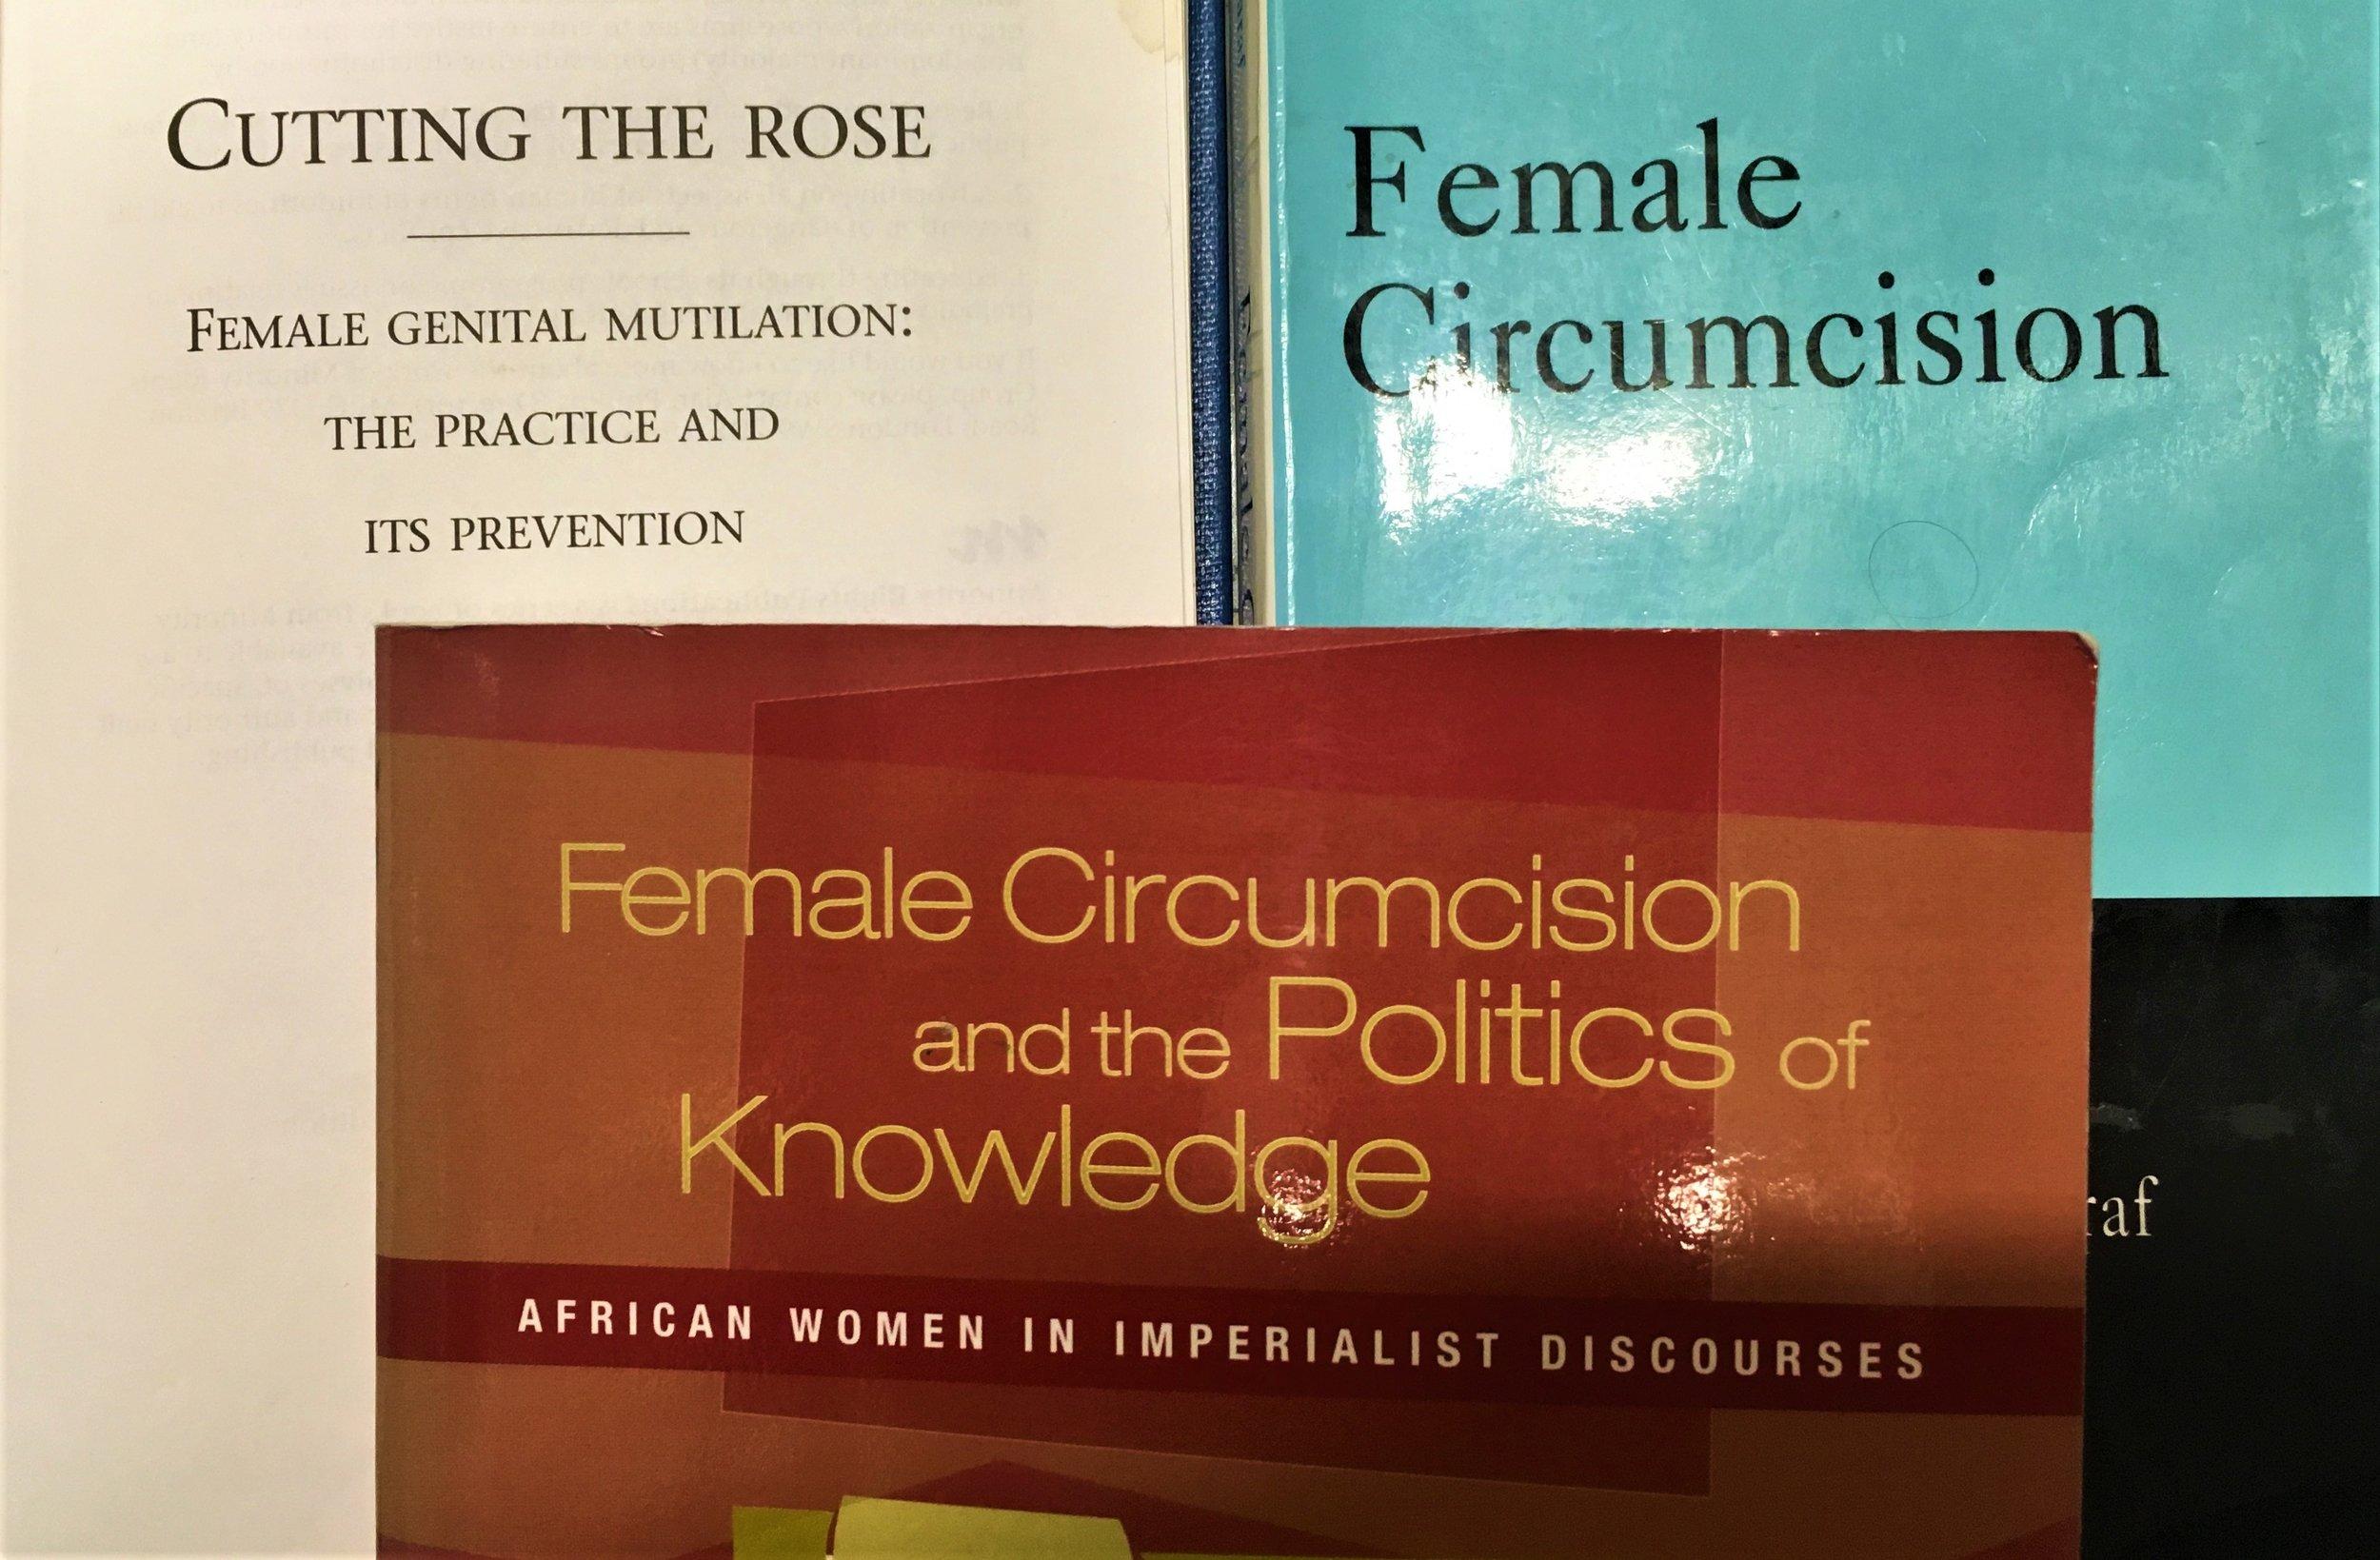 Academic debate on female genital mutilation